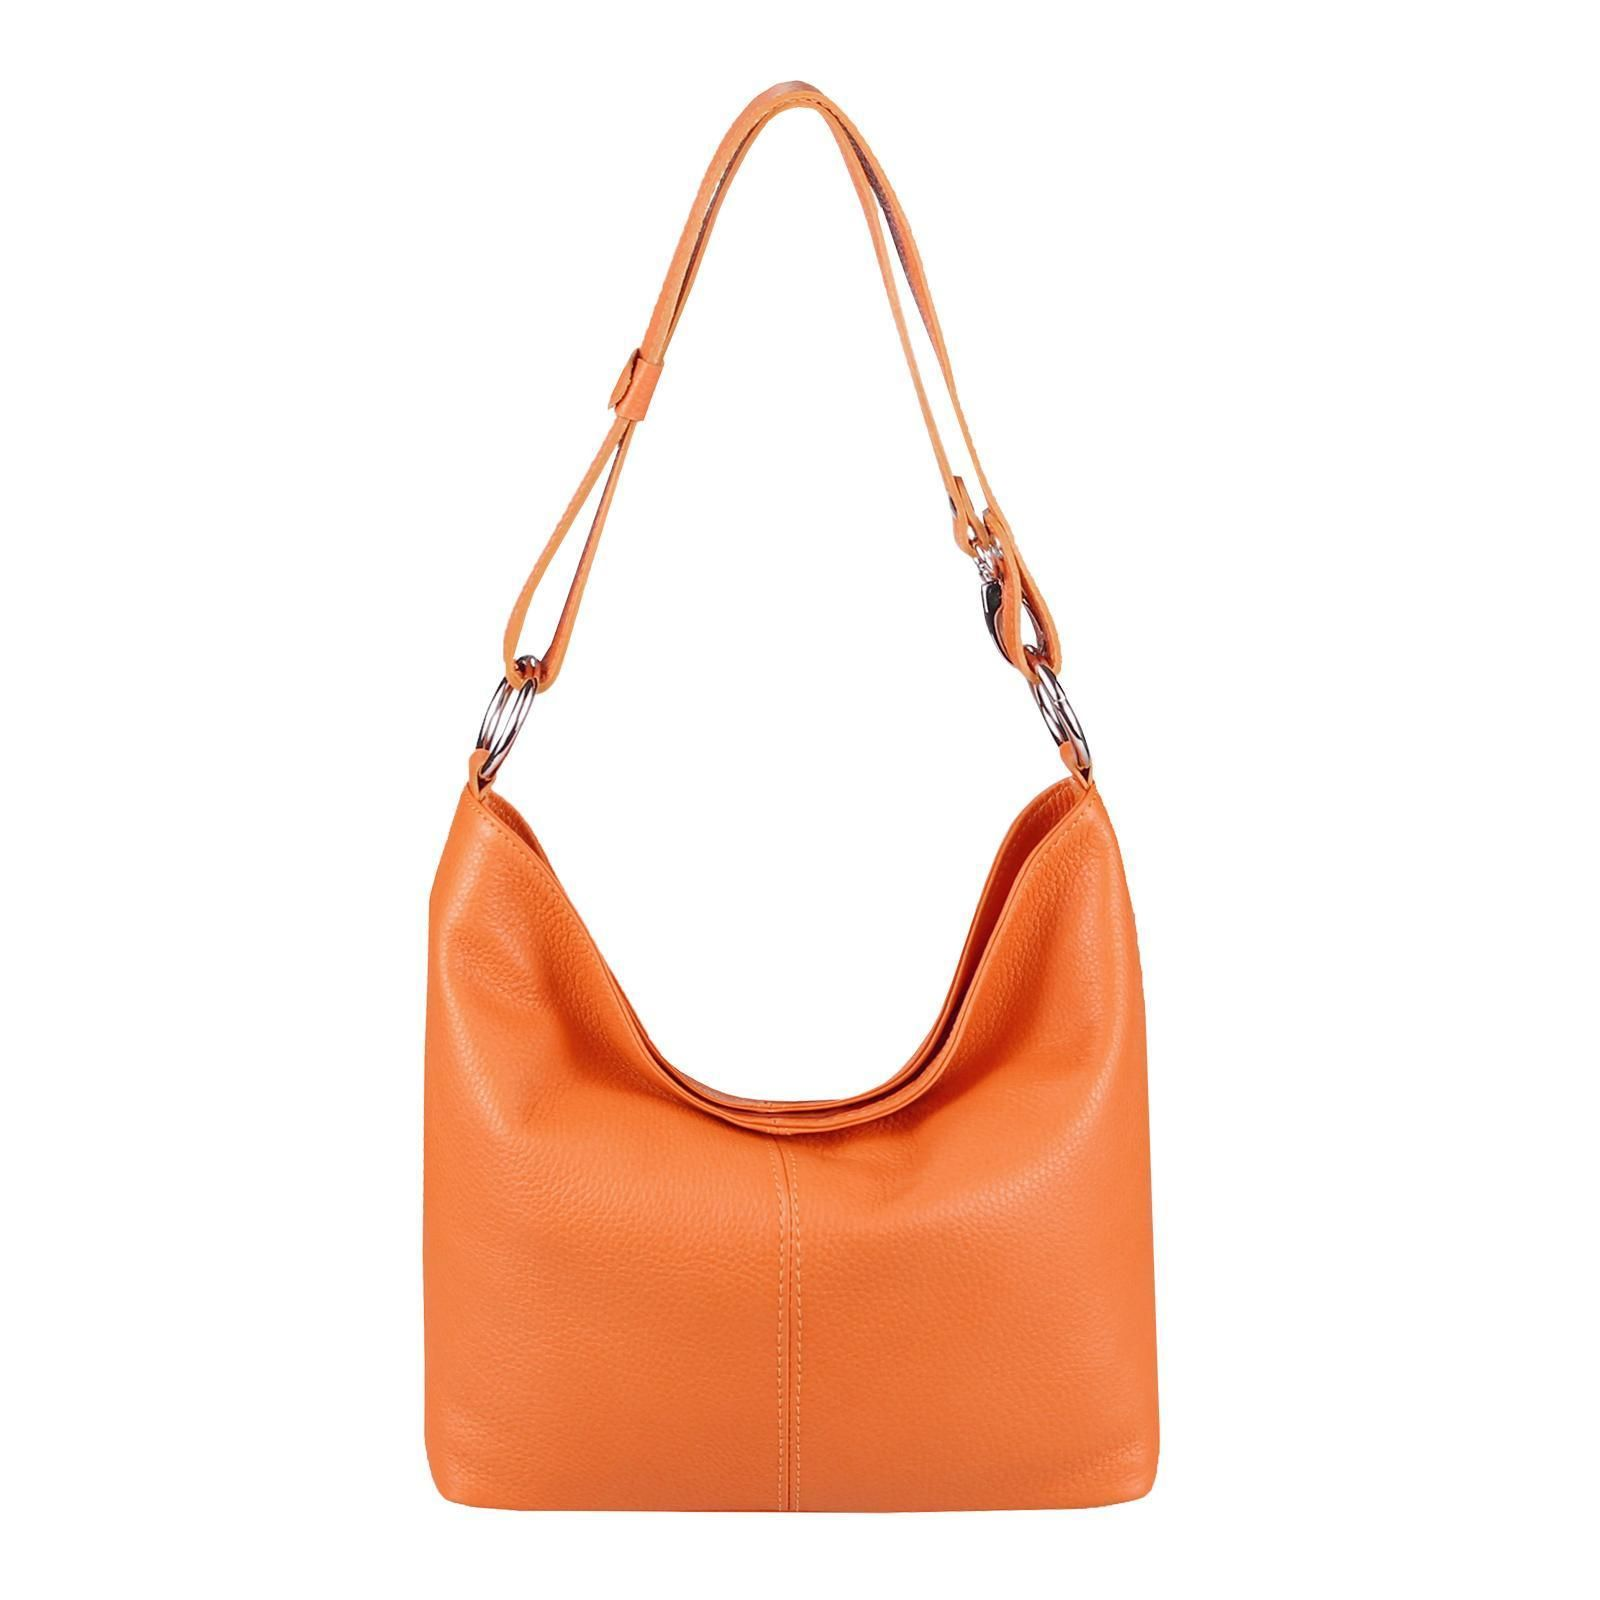 1769e228c6f9c Made in Italy Echt Leder Damen Tasche Shopper Hobo Bag Ledertasche Schultertasche  Umhängetasche Handtasche Henkeltasche